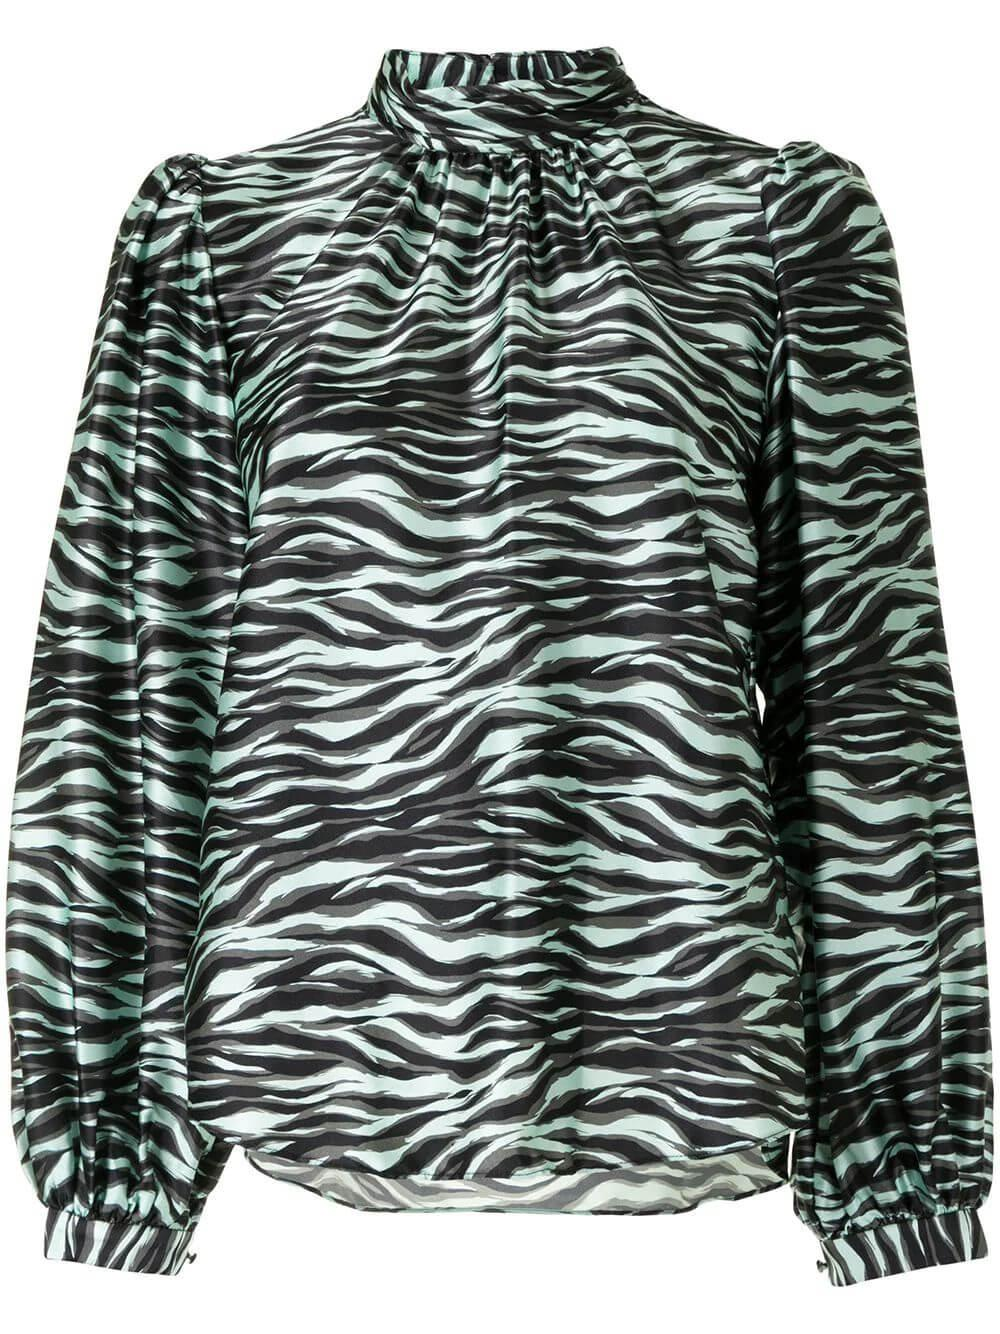 Jordan Zebra Print Top Item # 121-2106-A